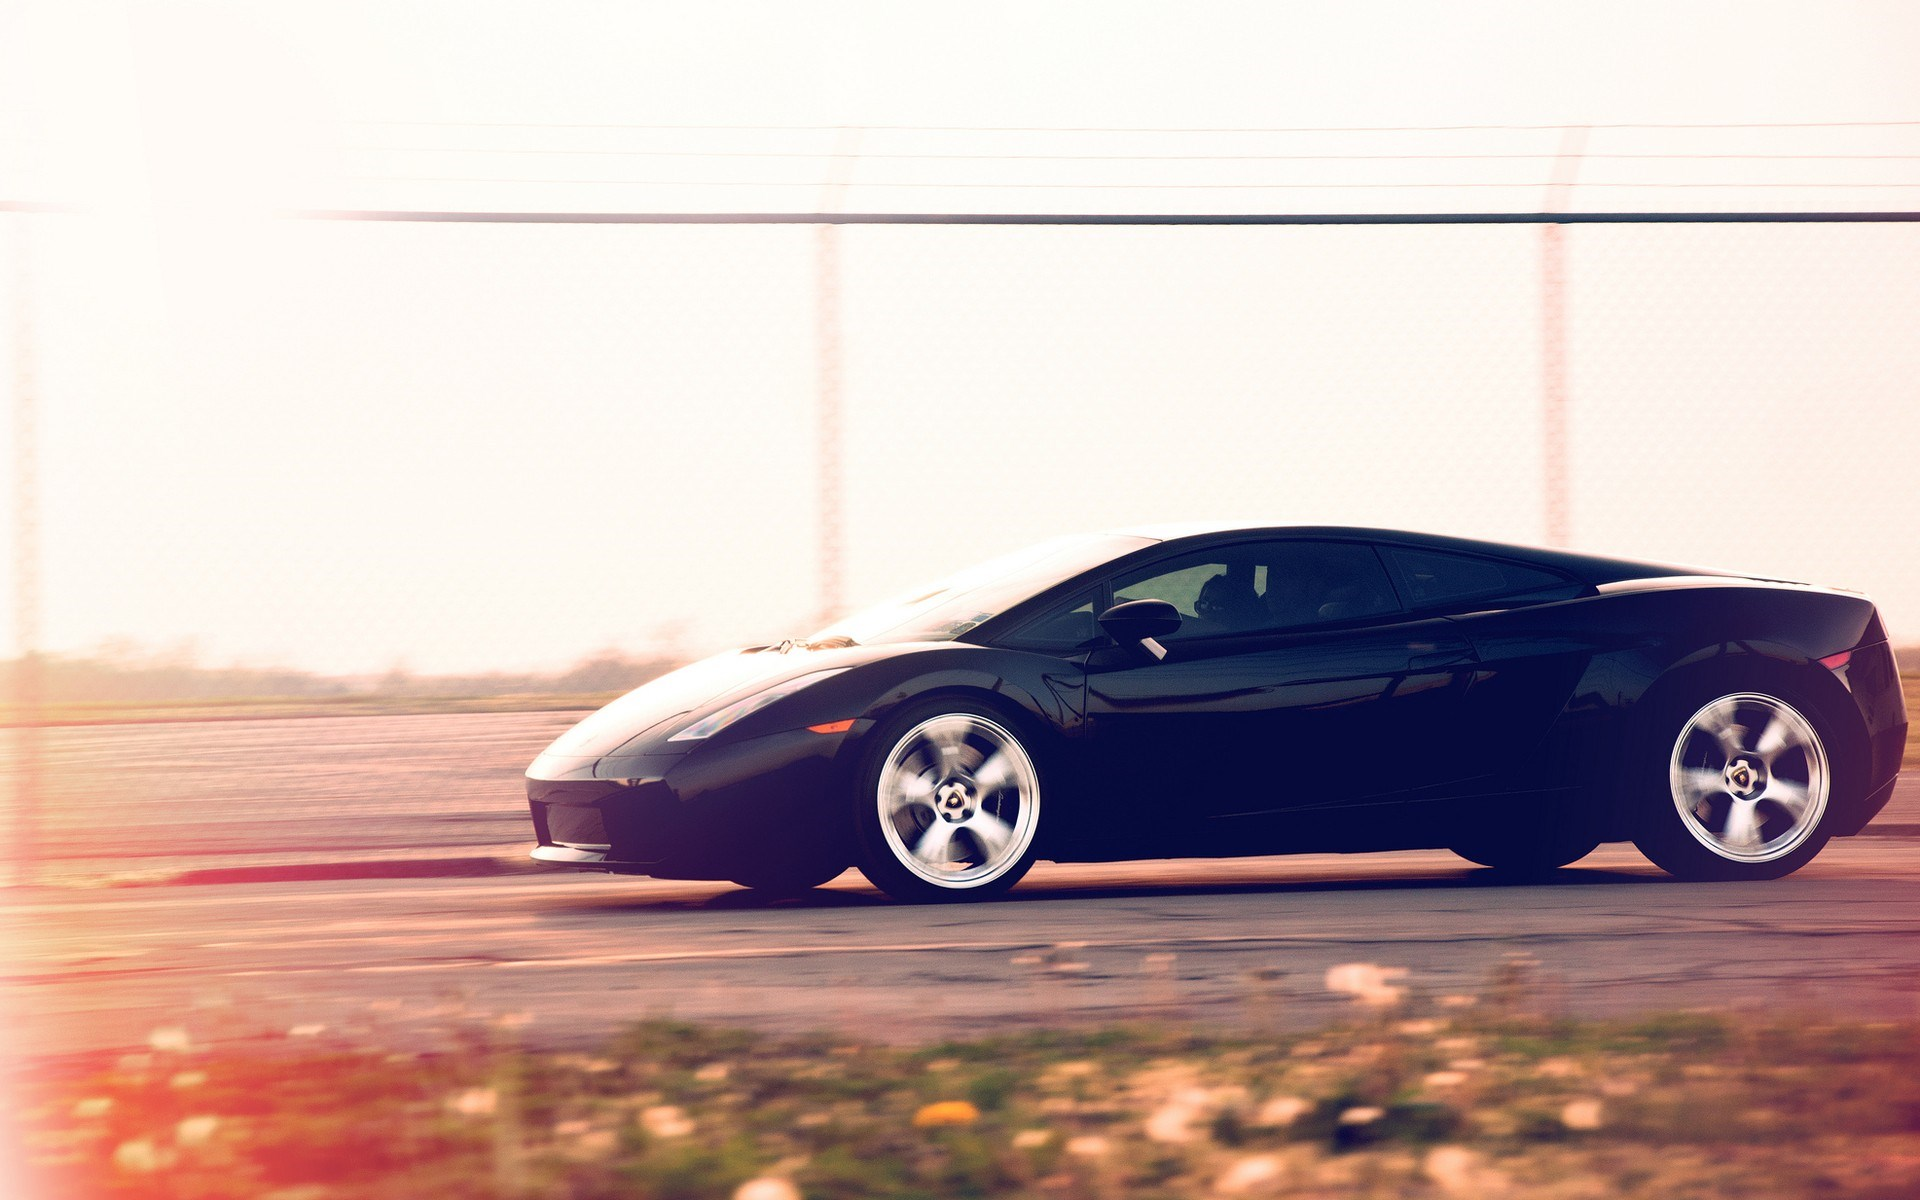 Lamborghini Gallardo Motion Blur